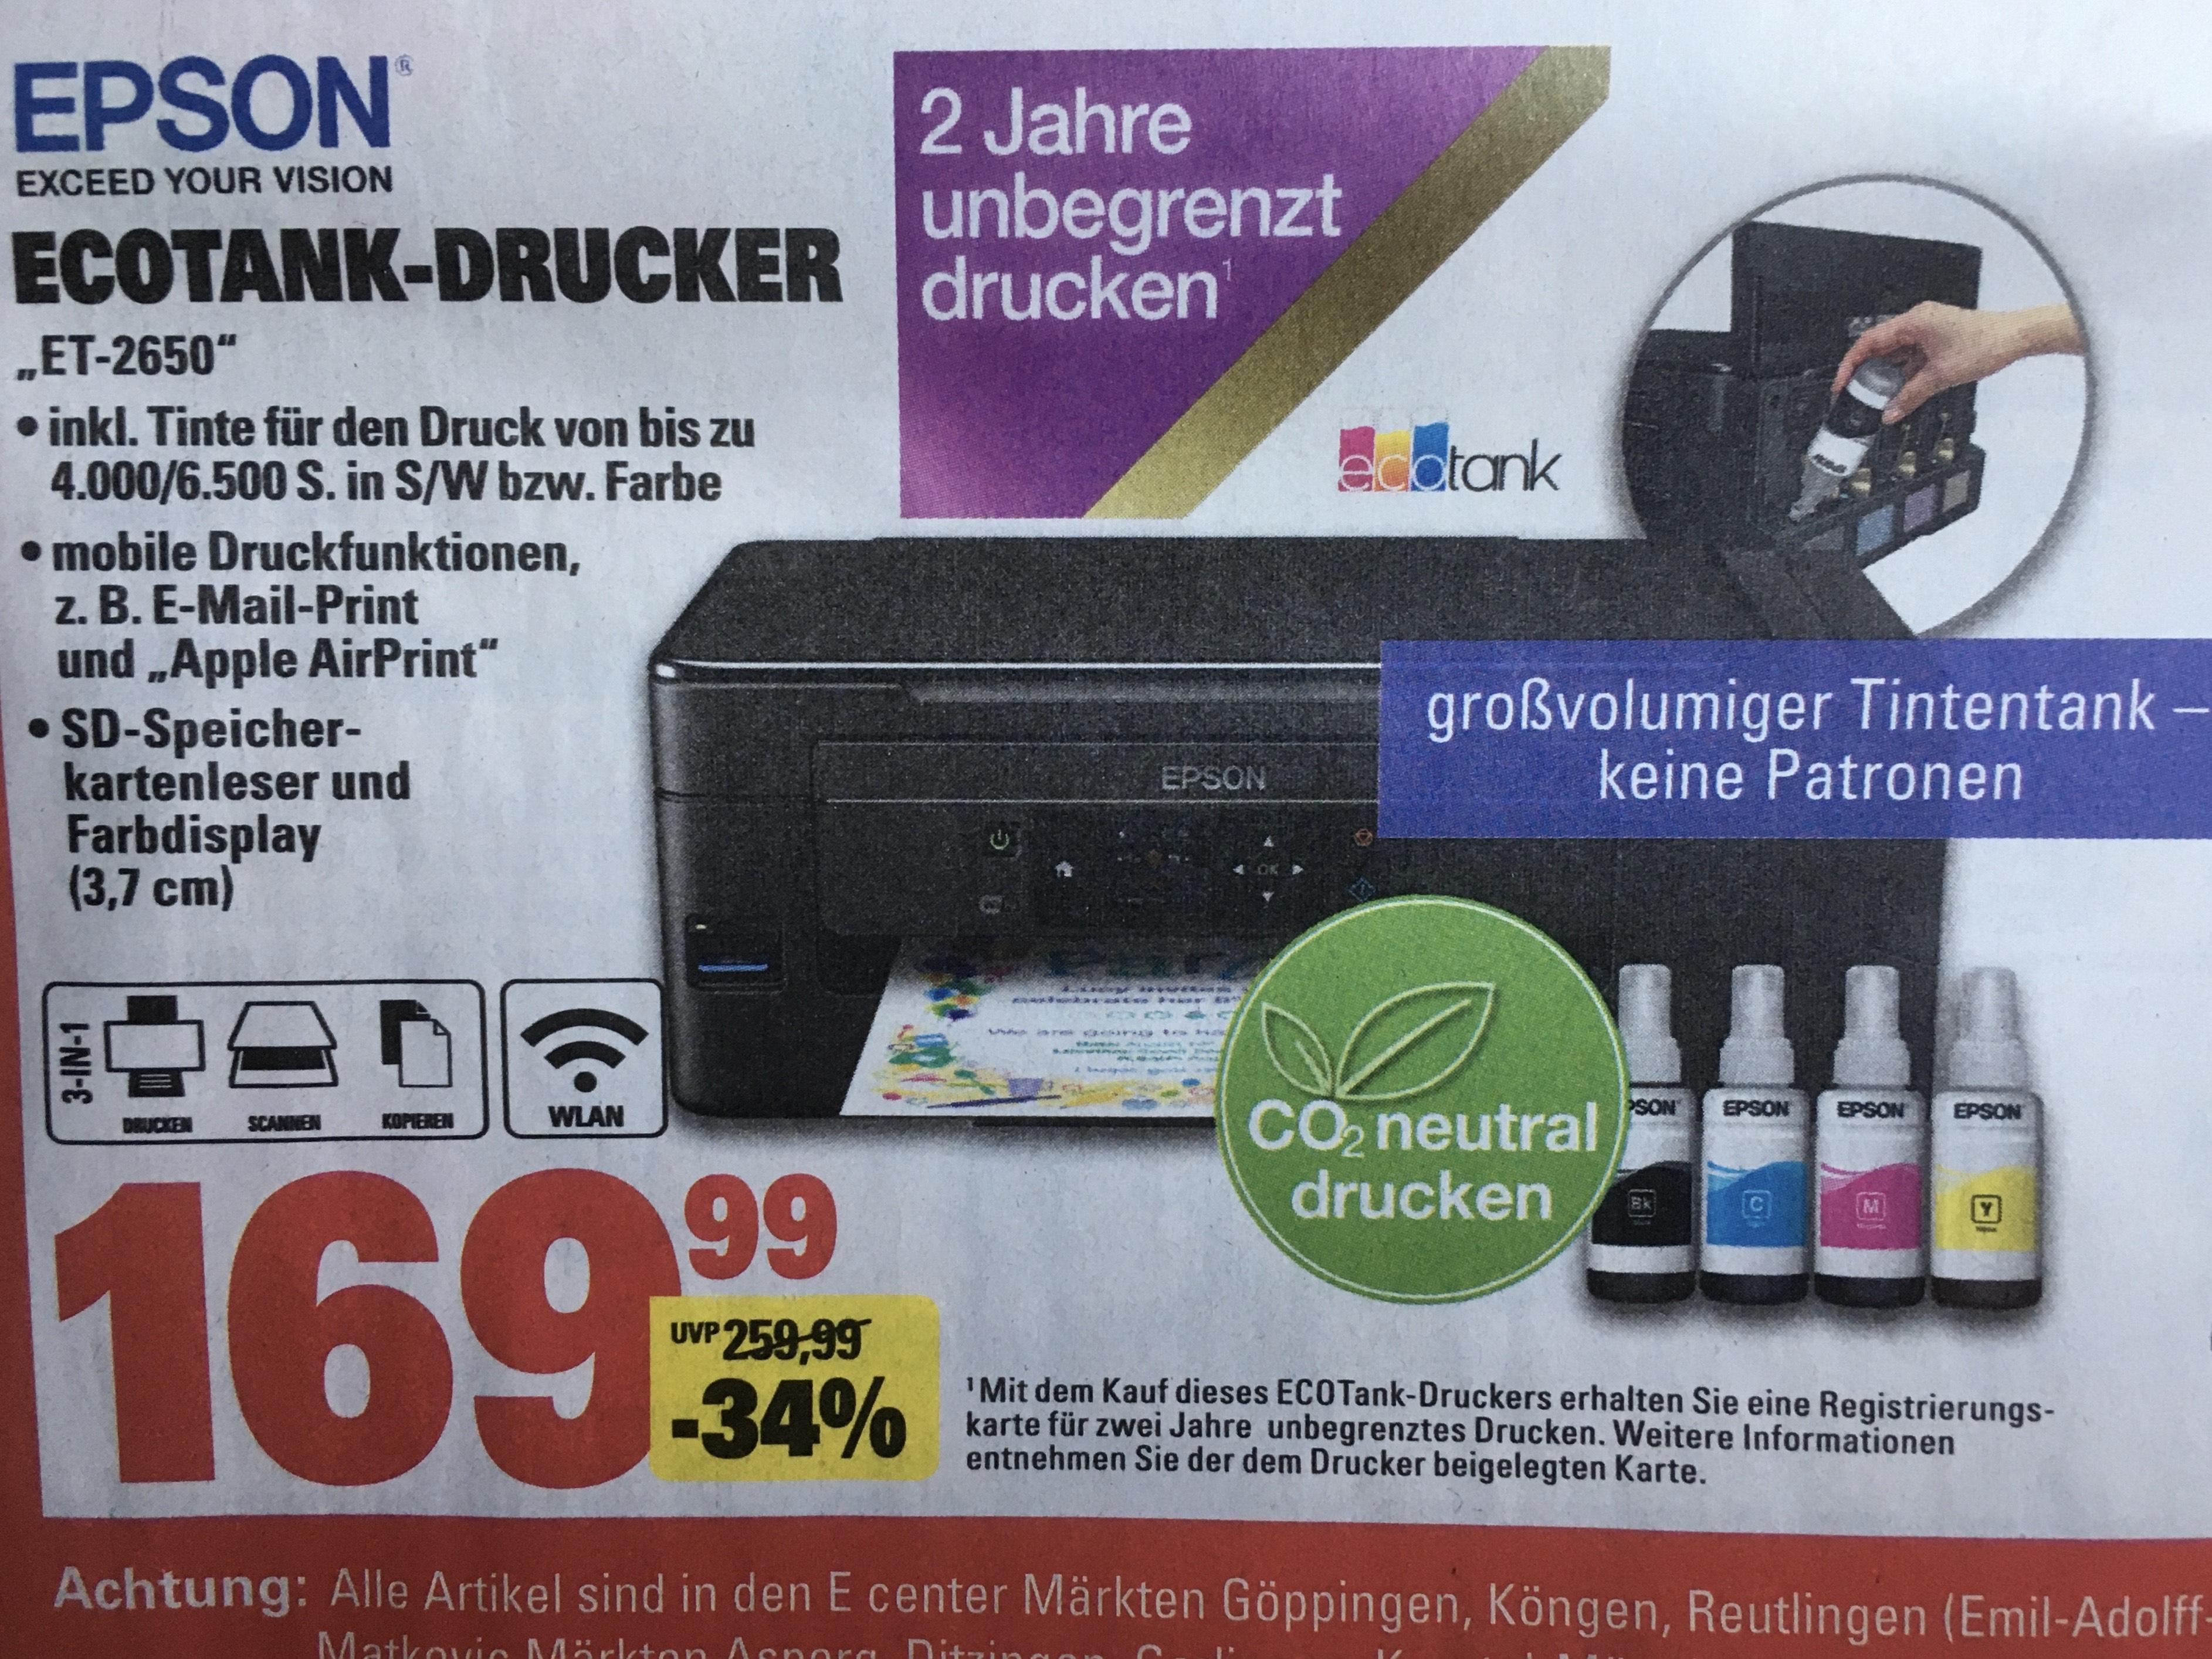 [Marktkauf] ab 18.05 Epson EcoTank ET-2650 nachfüllbares 3-in-1 Tintenstrahl Multifunktionsgerät DIN A4, WiFi, Display, USB 2.0)